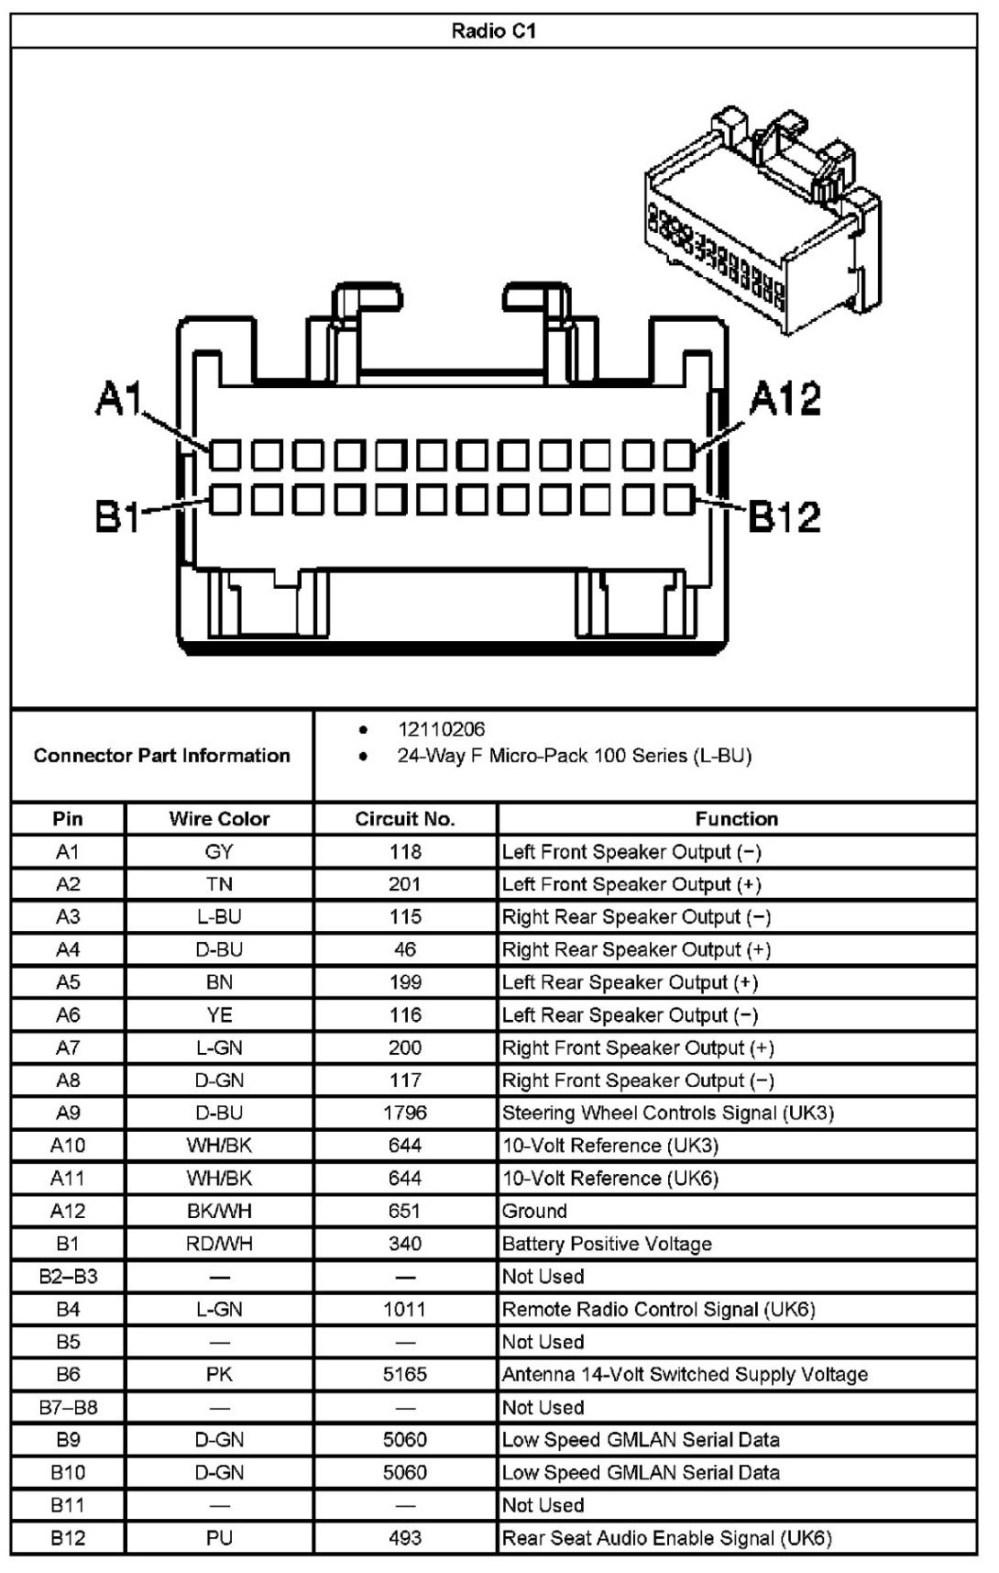 medium resolution of 2001 chevy silverado radio wiring diagram wirings diagram dodge wiring harness diagram 2003 tahoe radio wiring